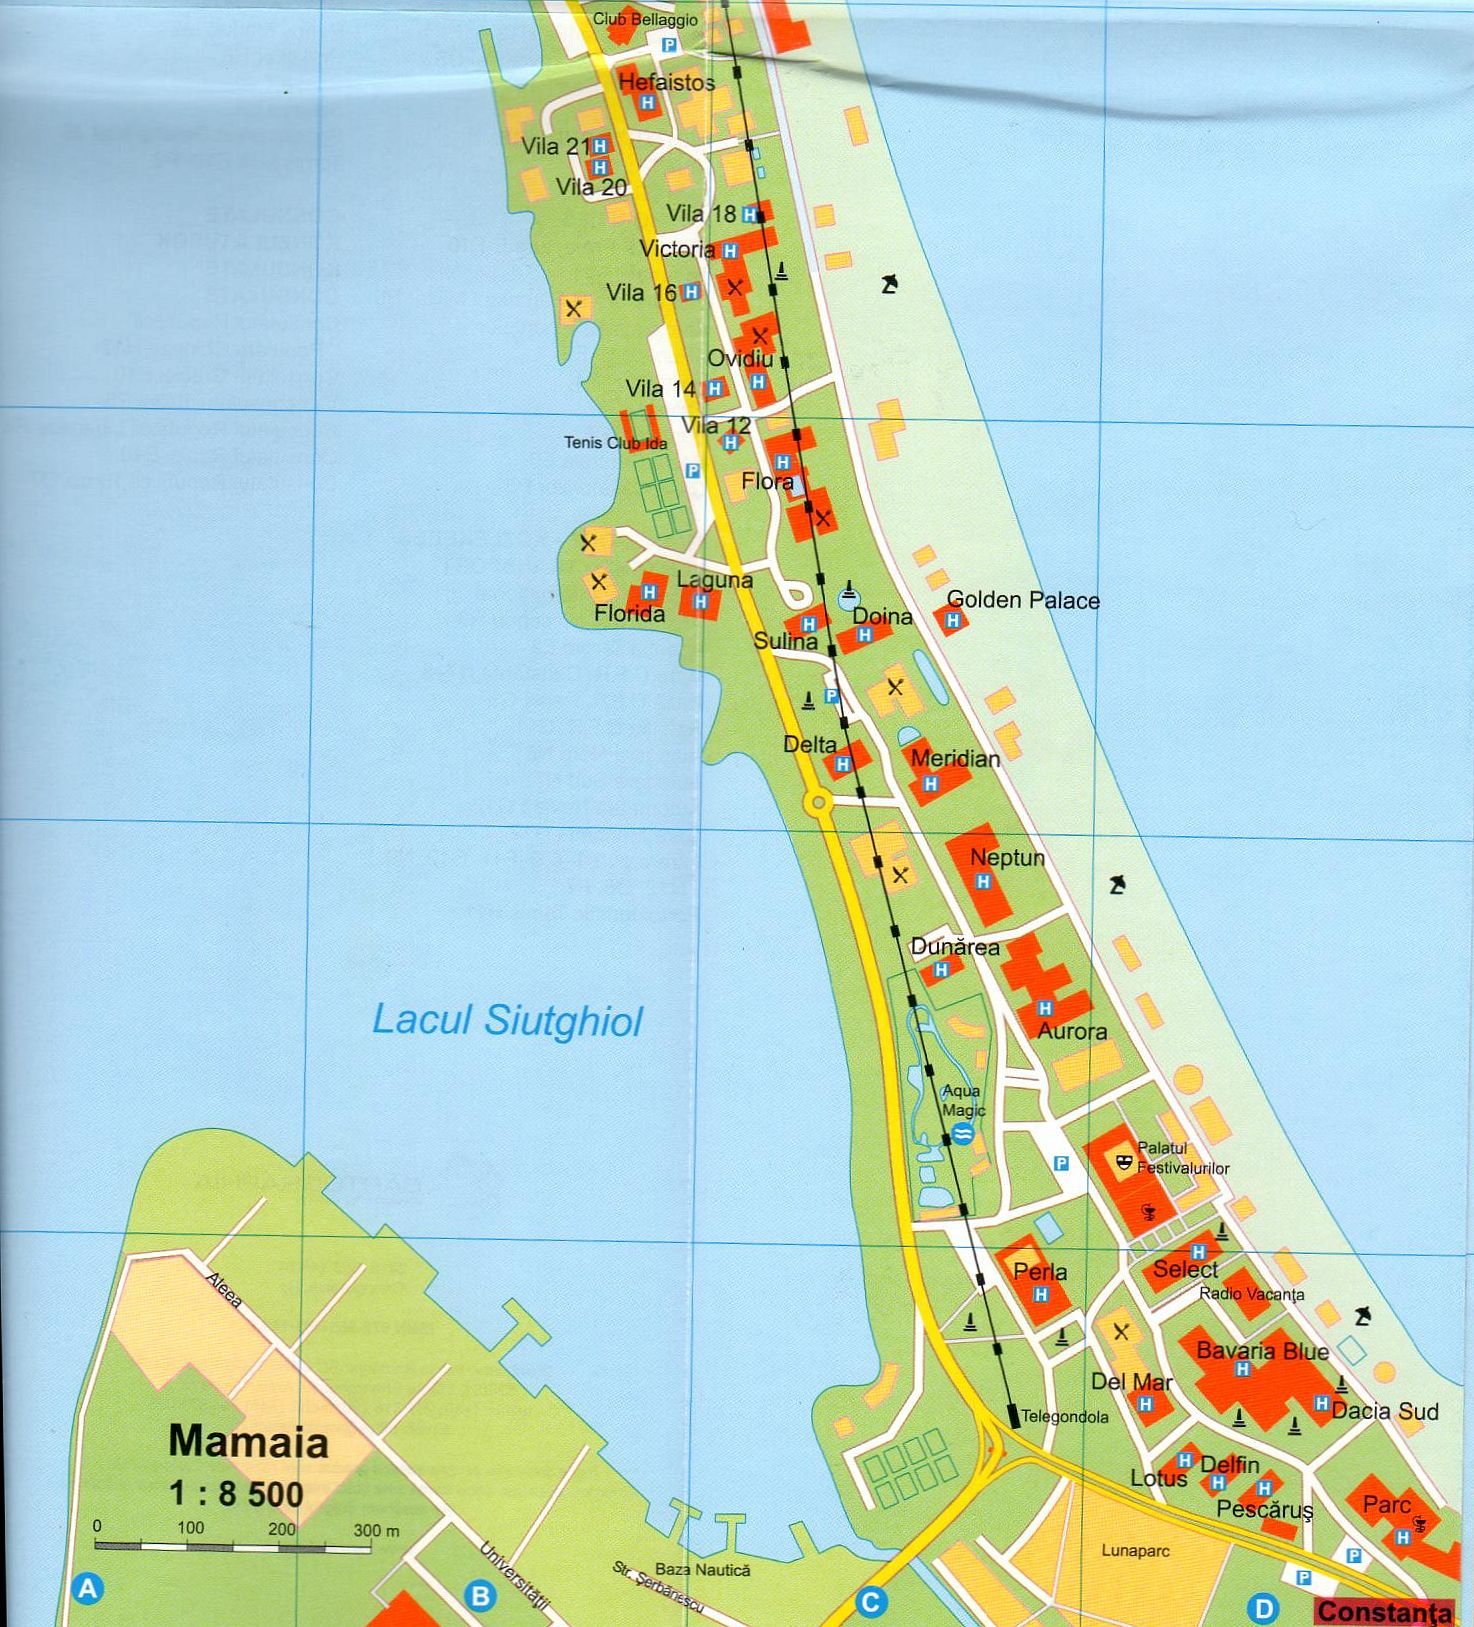 Constanta sample Mamaia map 1:8.500